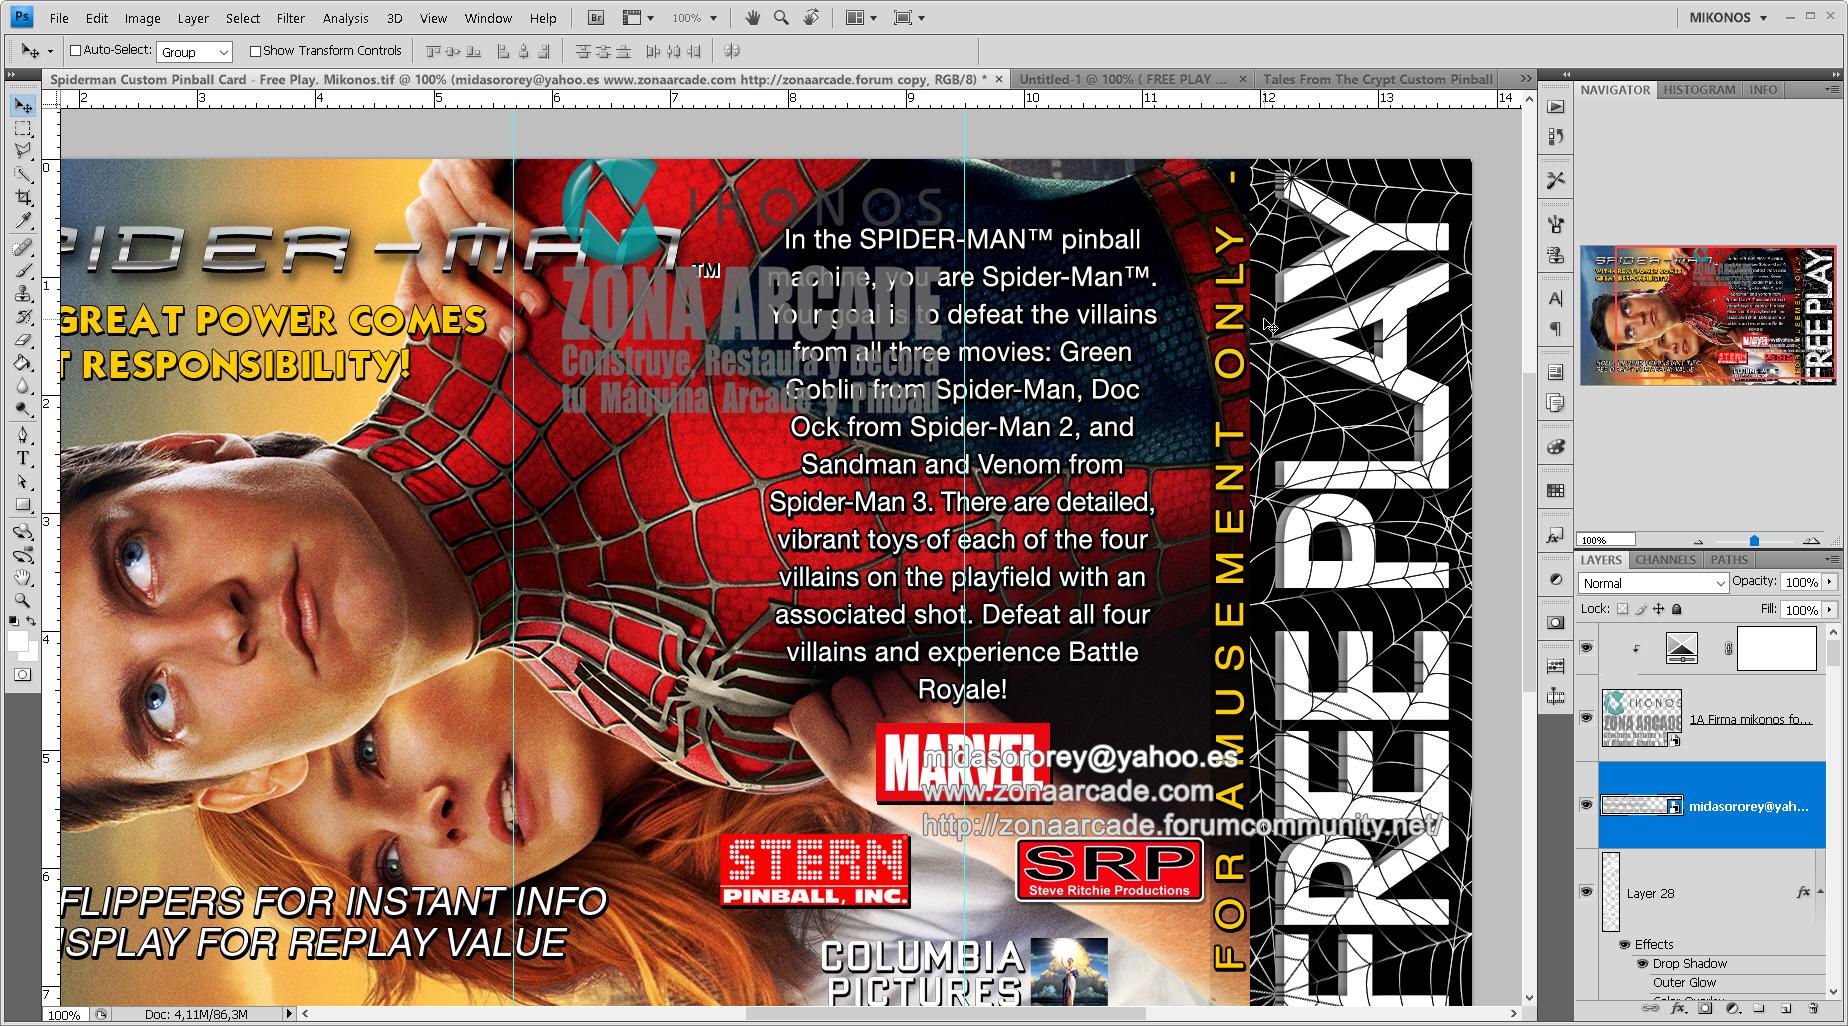 Spiderman%20Custom%20Pinball%20Card%20-%20Free%20Play.%20Mikonos2.jpg